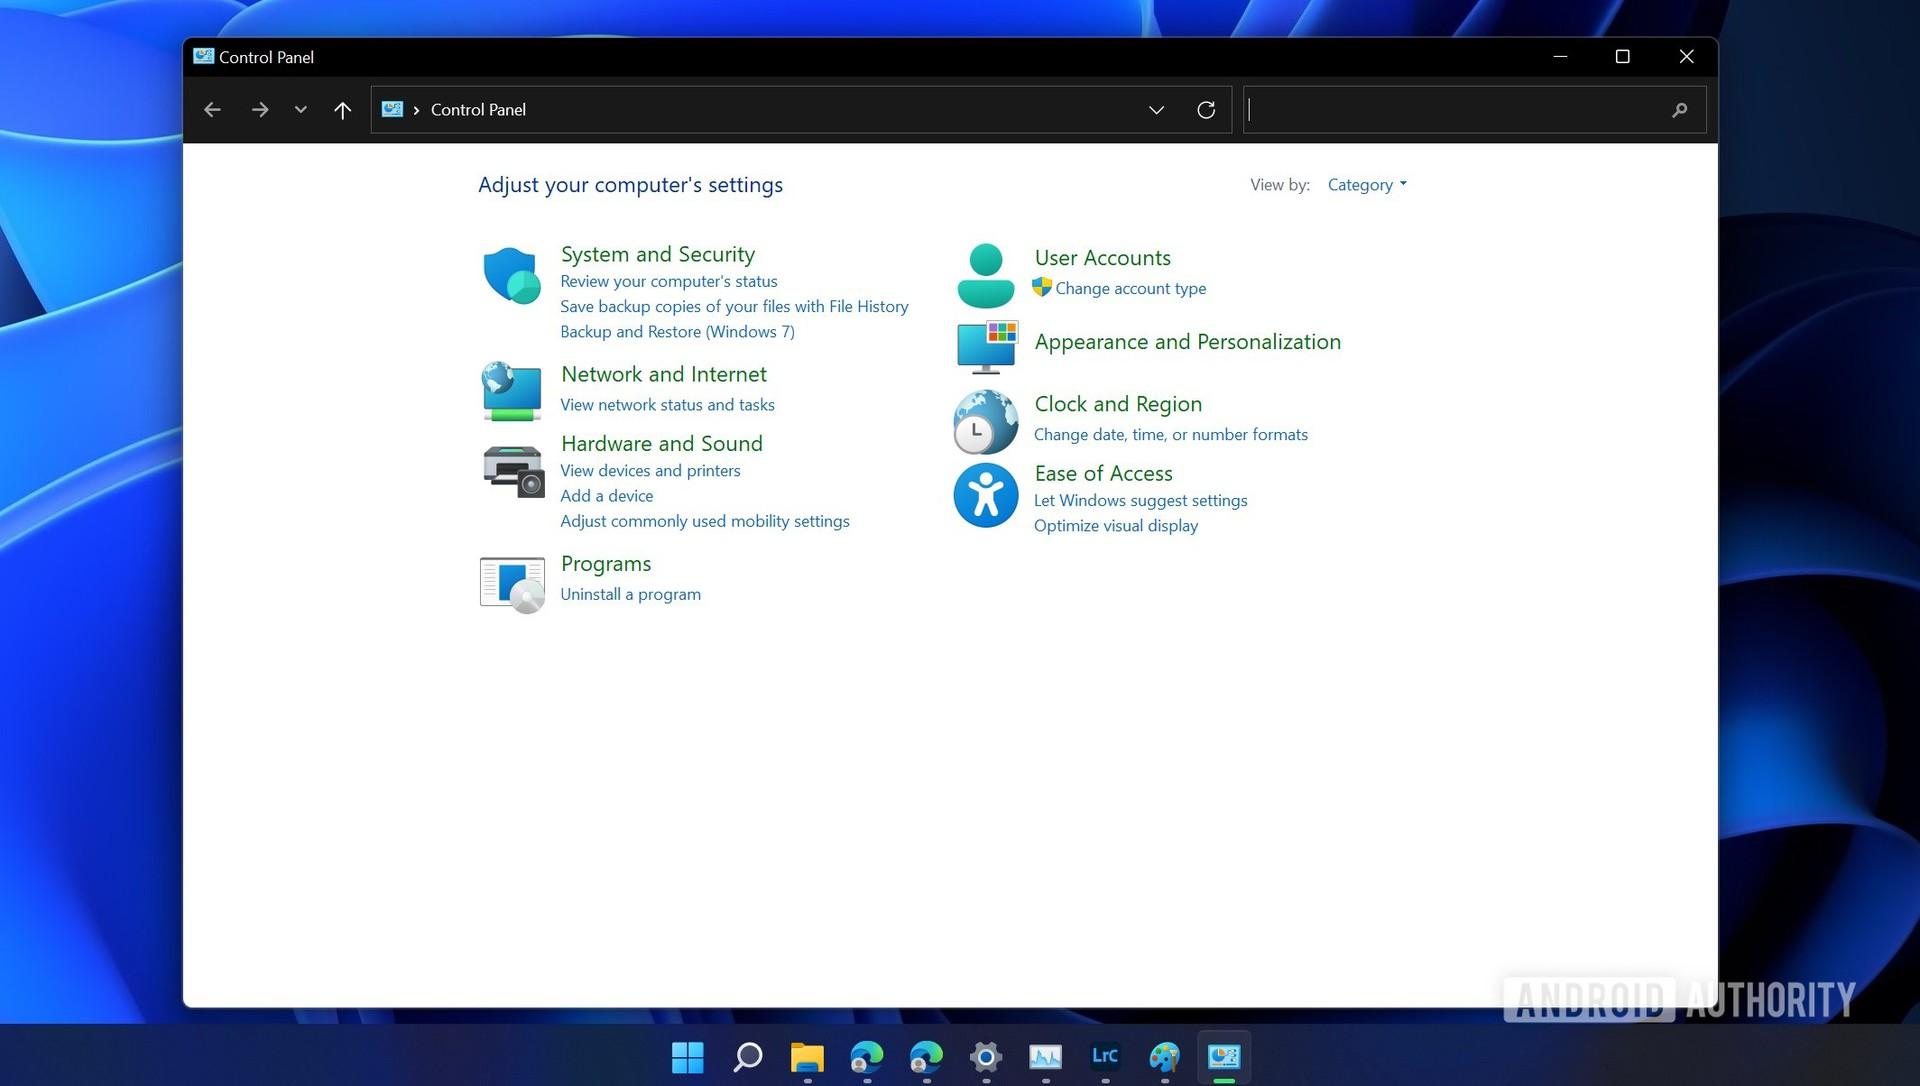 Windows 11 beta control panel